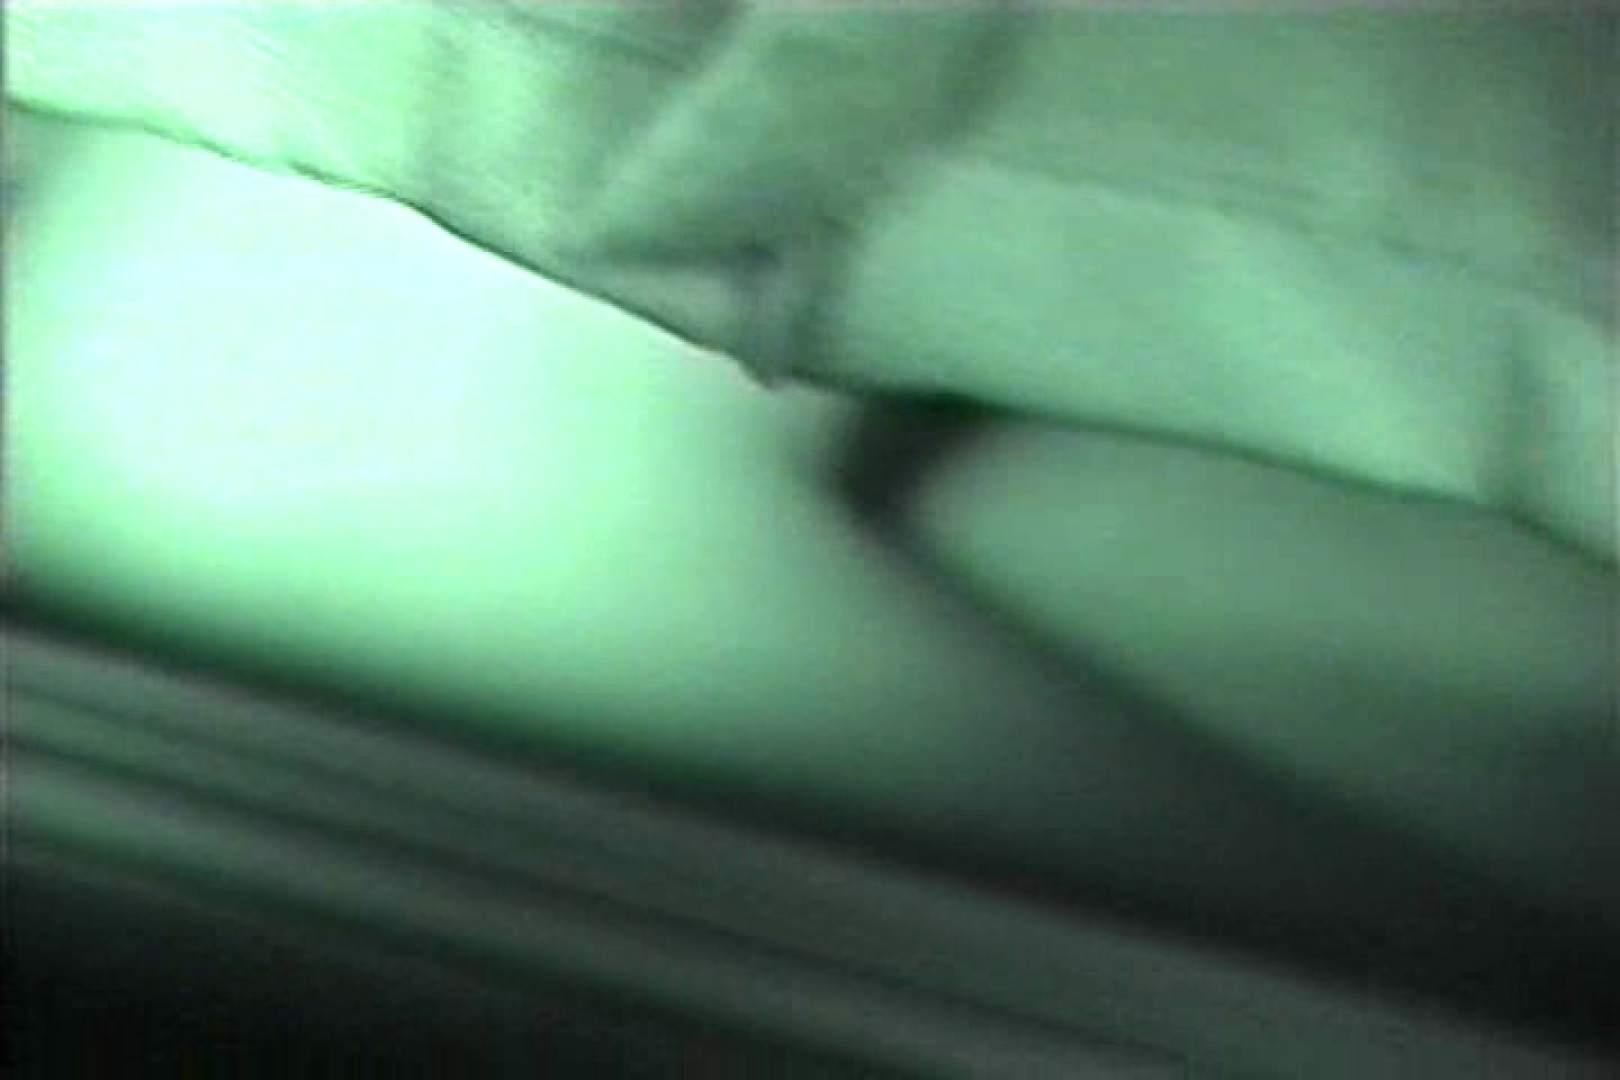 MASAさんの待ち伏せ撮り! 赤外線カーセックスVol.7 接写   カーセックス  60pic 37